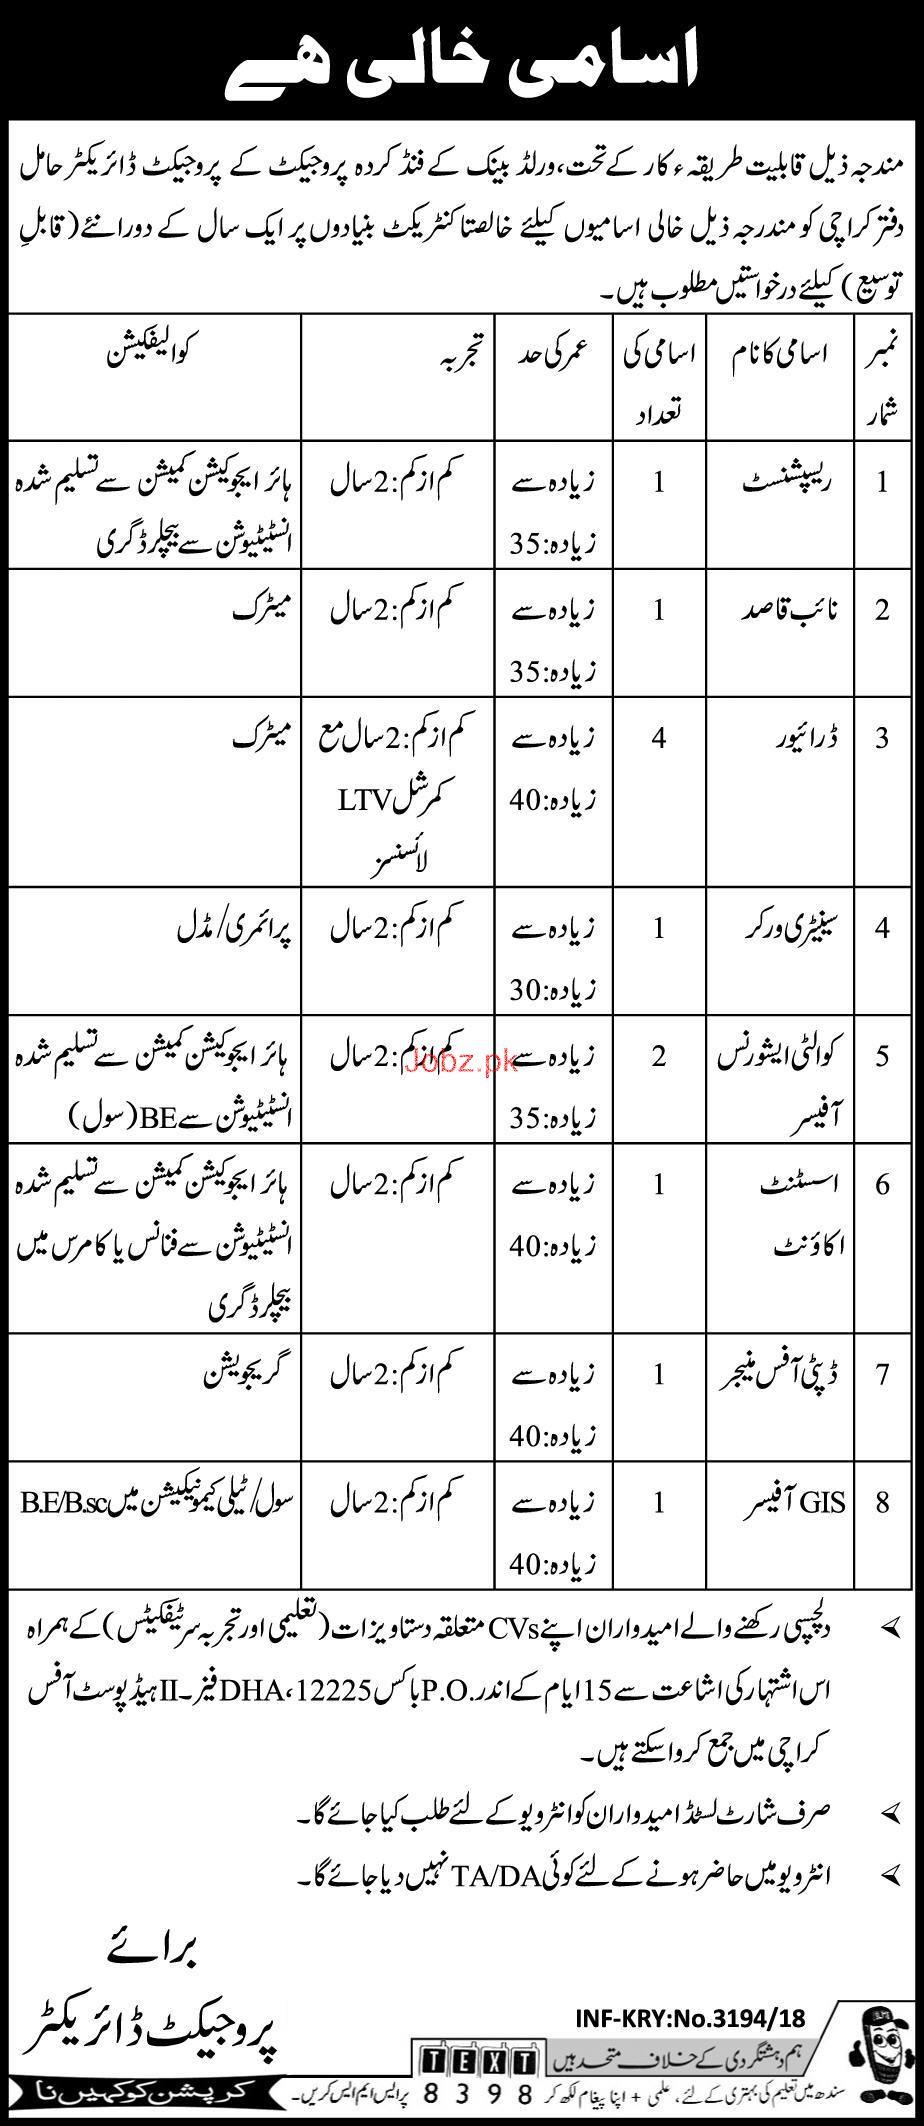 Male / Female Receptionists, Naib Qasid Job Opportunity 2019 Job